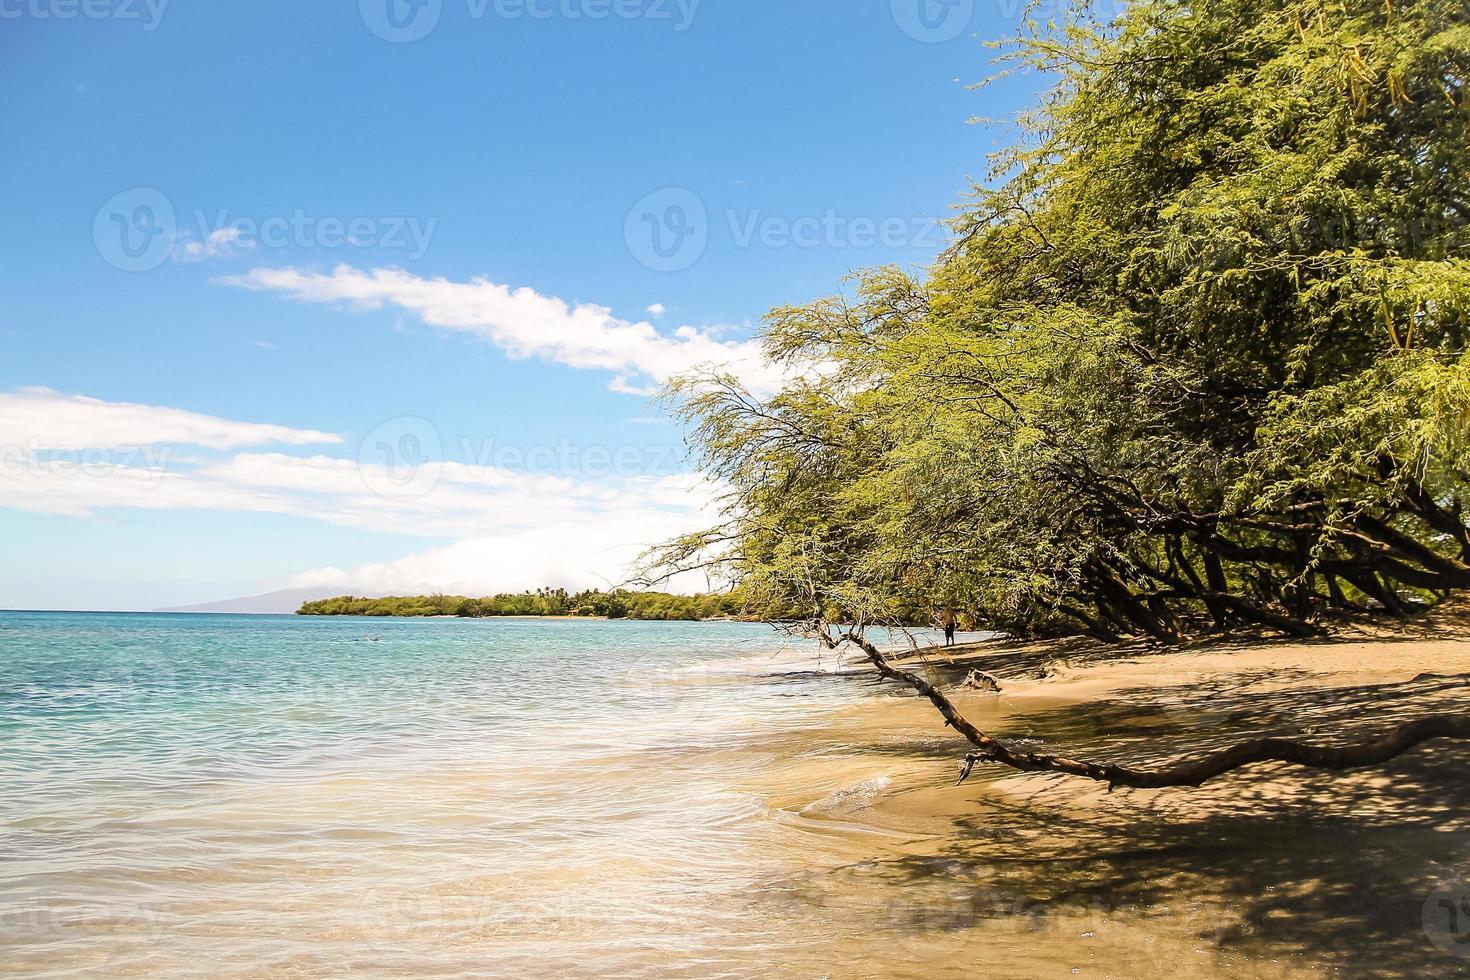 bellissima spiaggia di Maui foto